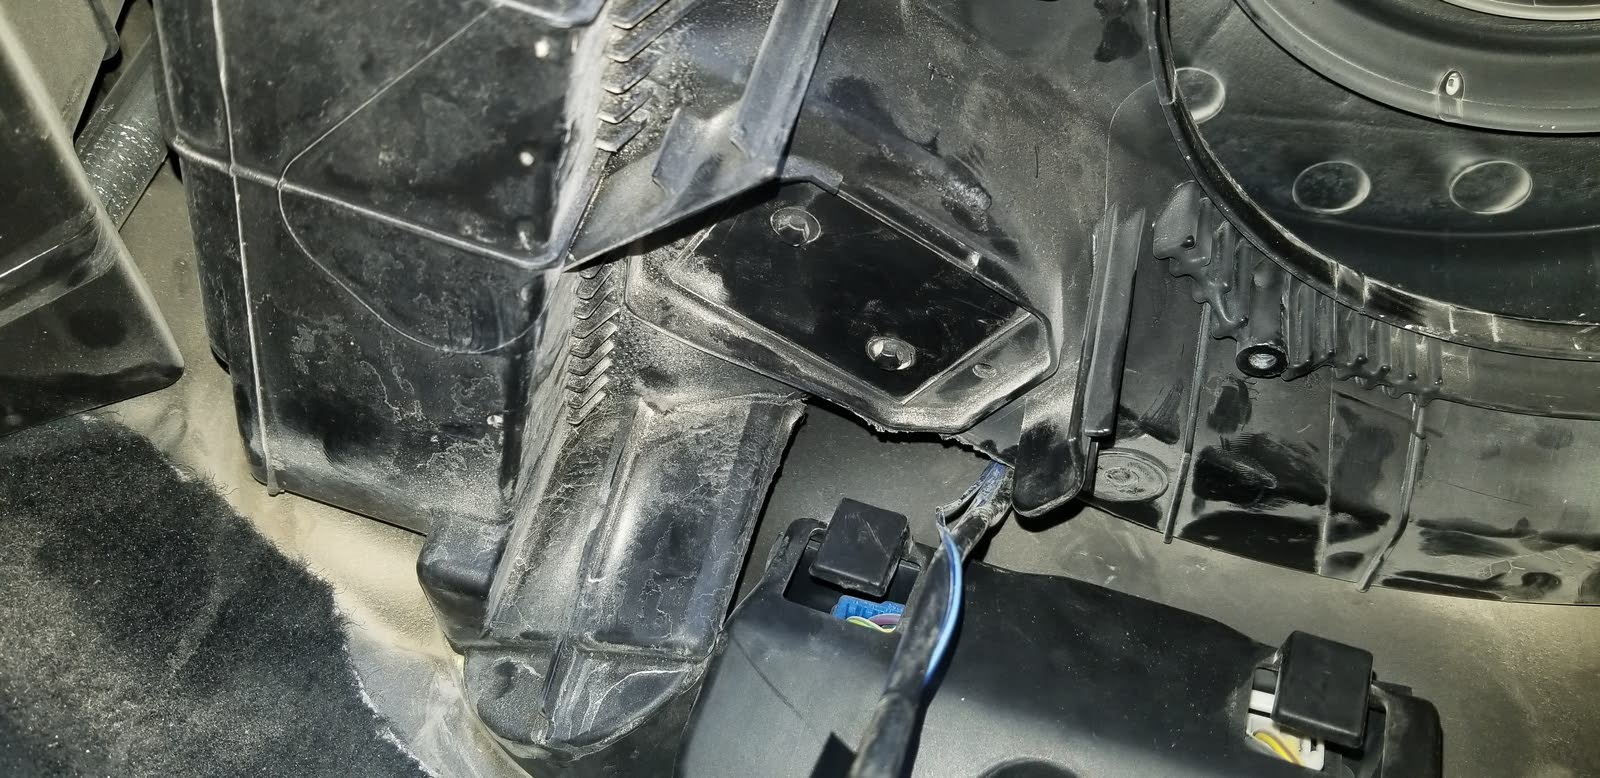 Dodge Durango Heater Problems